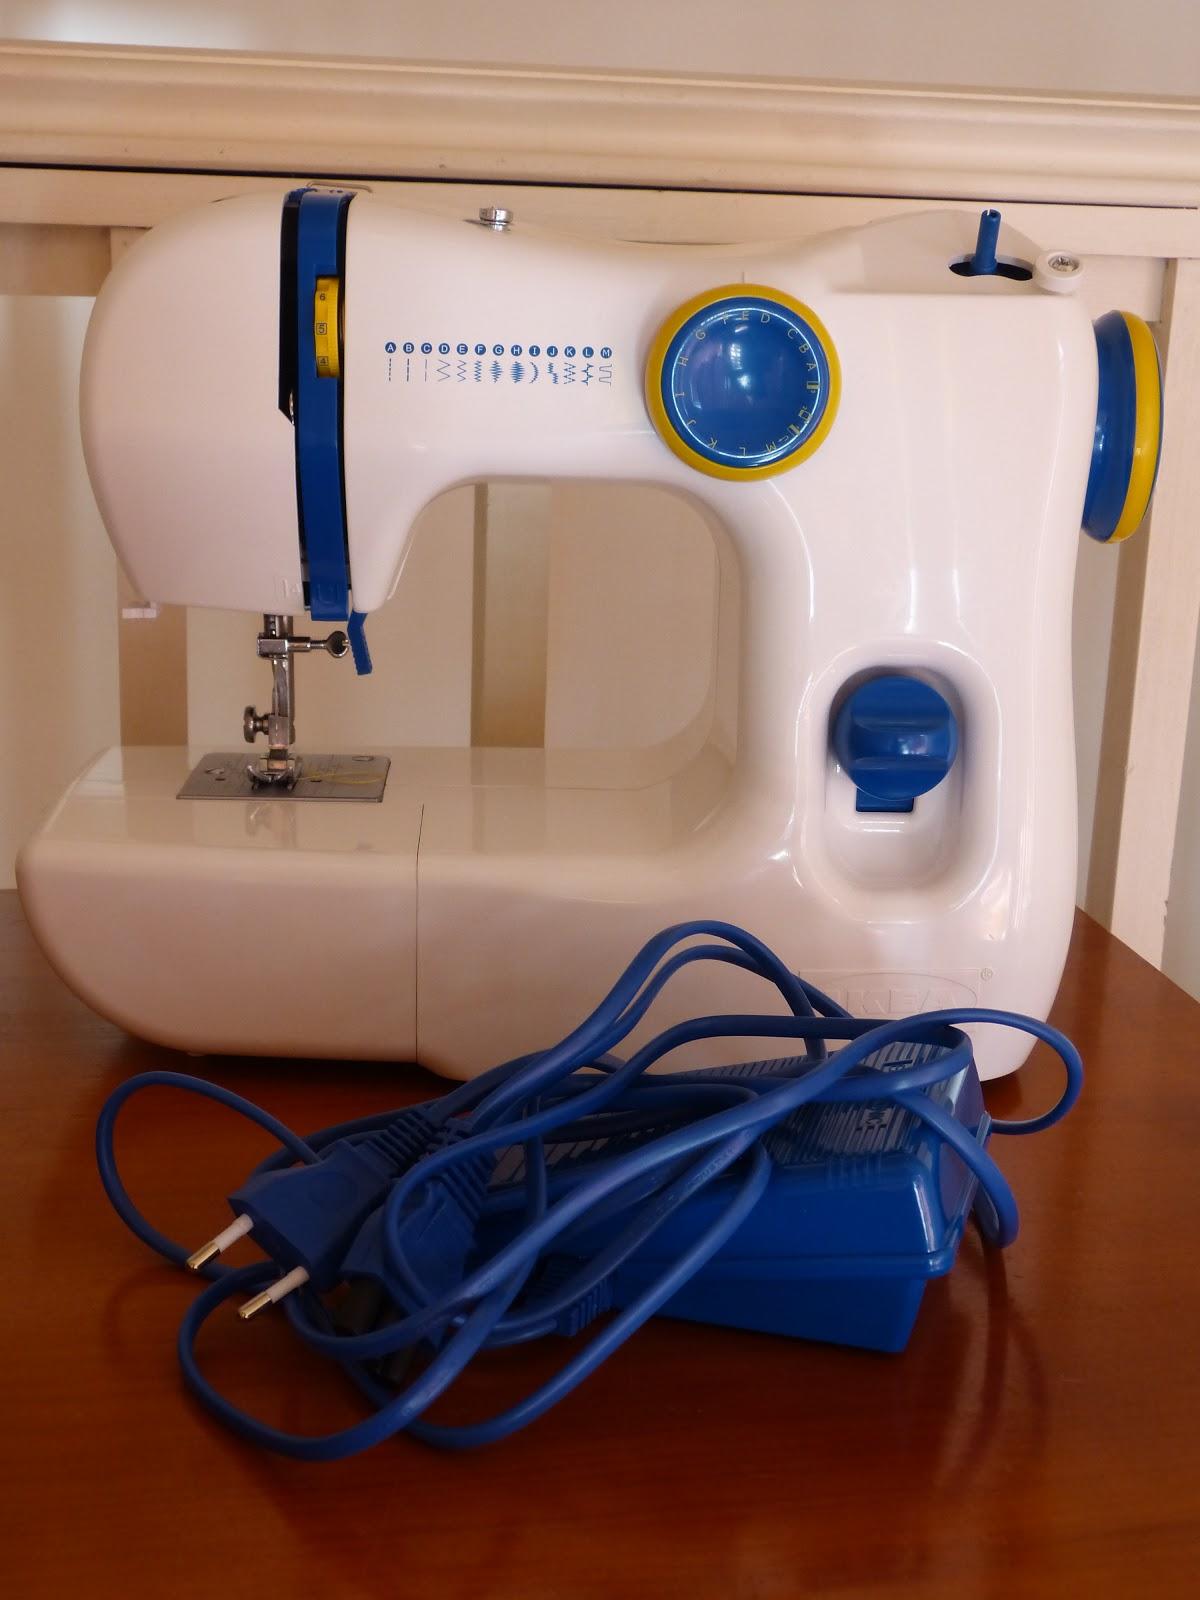 Mi casa decoracion: Ikea maquina de coser